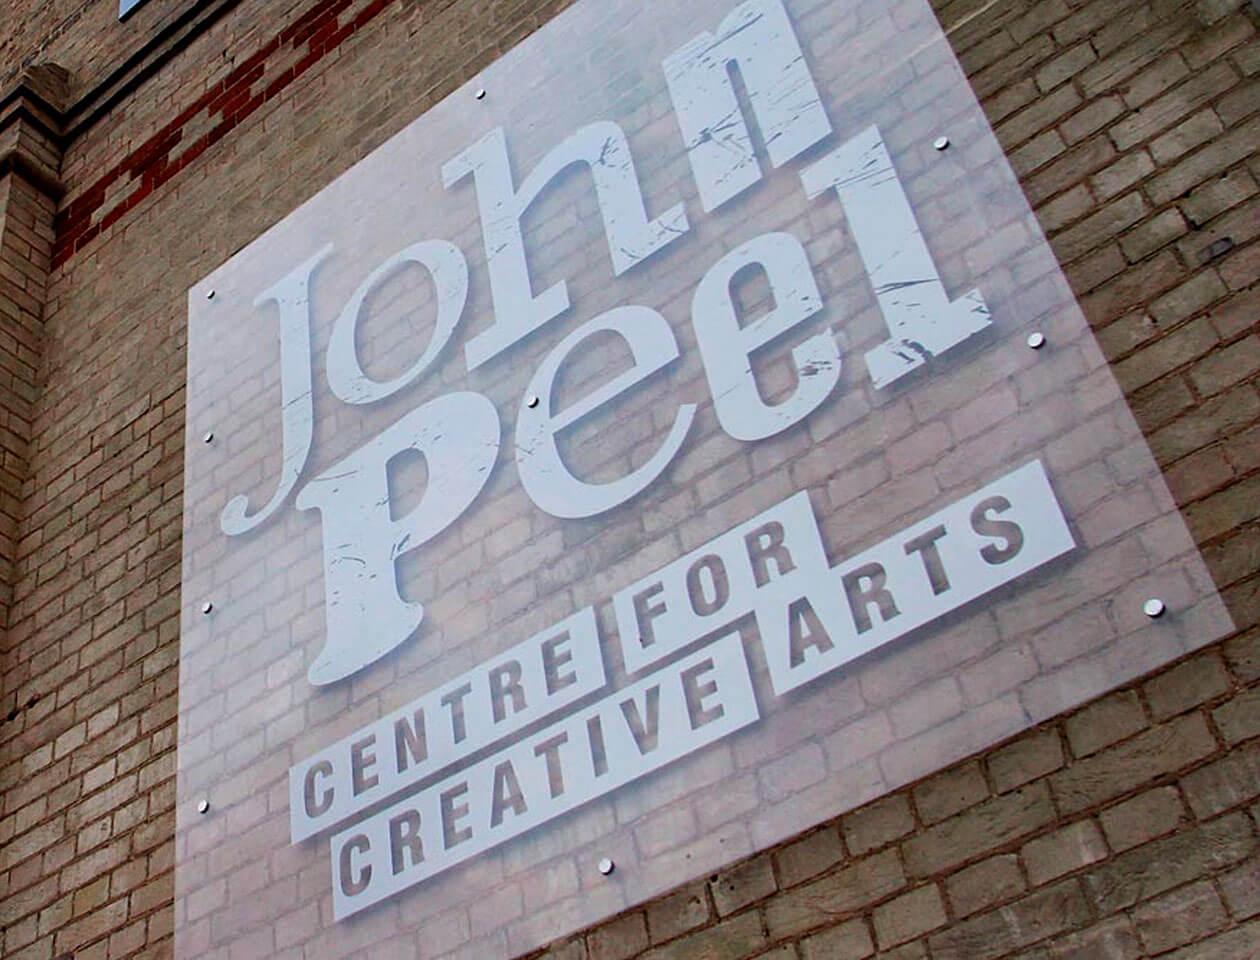 john peel client of hag